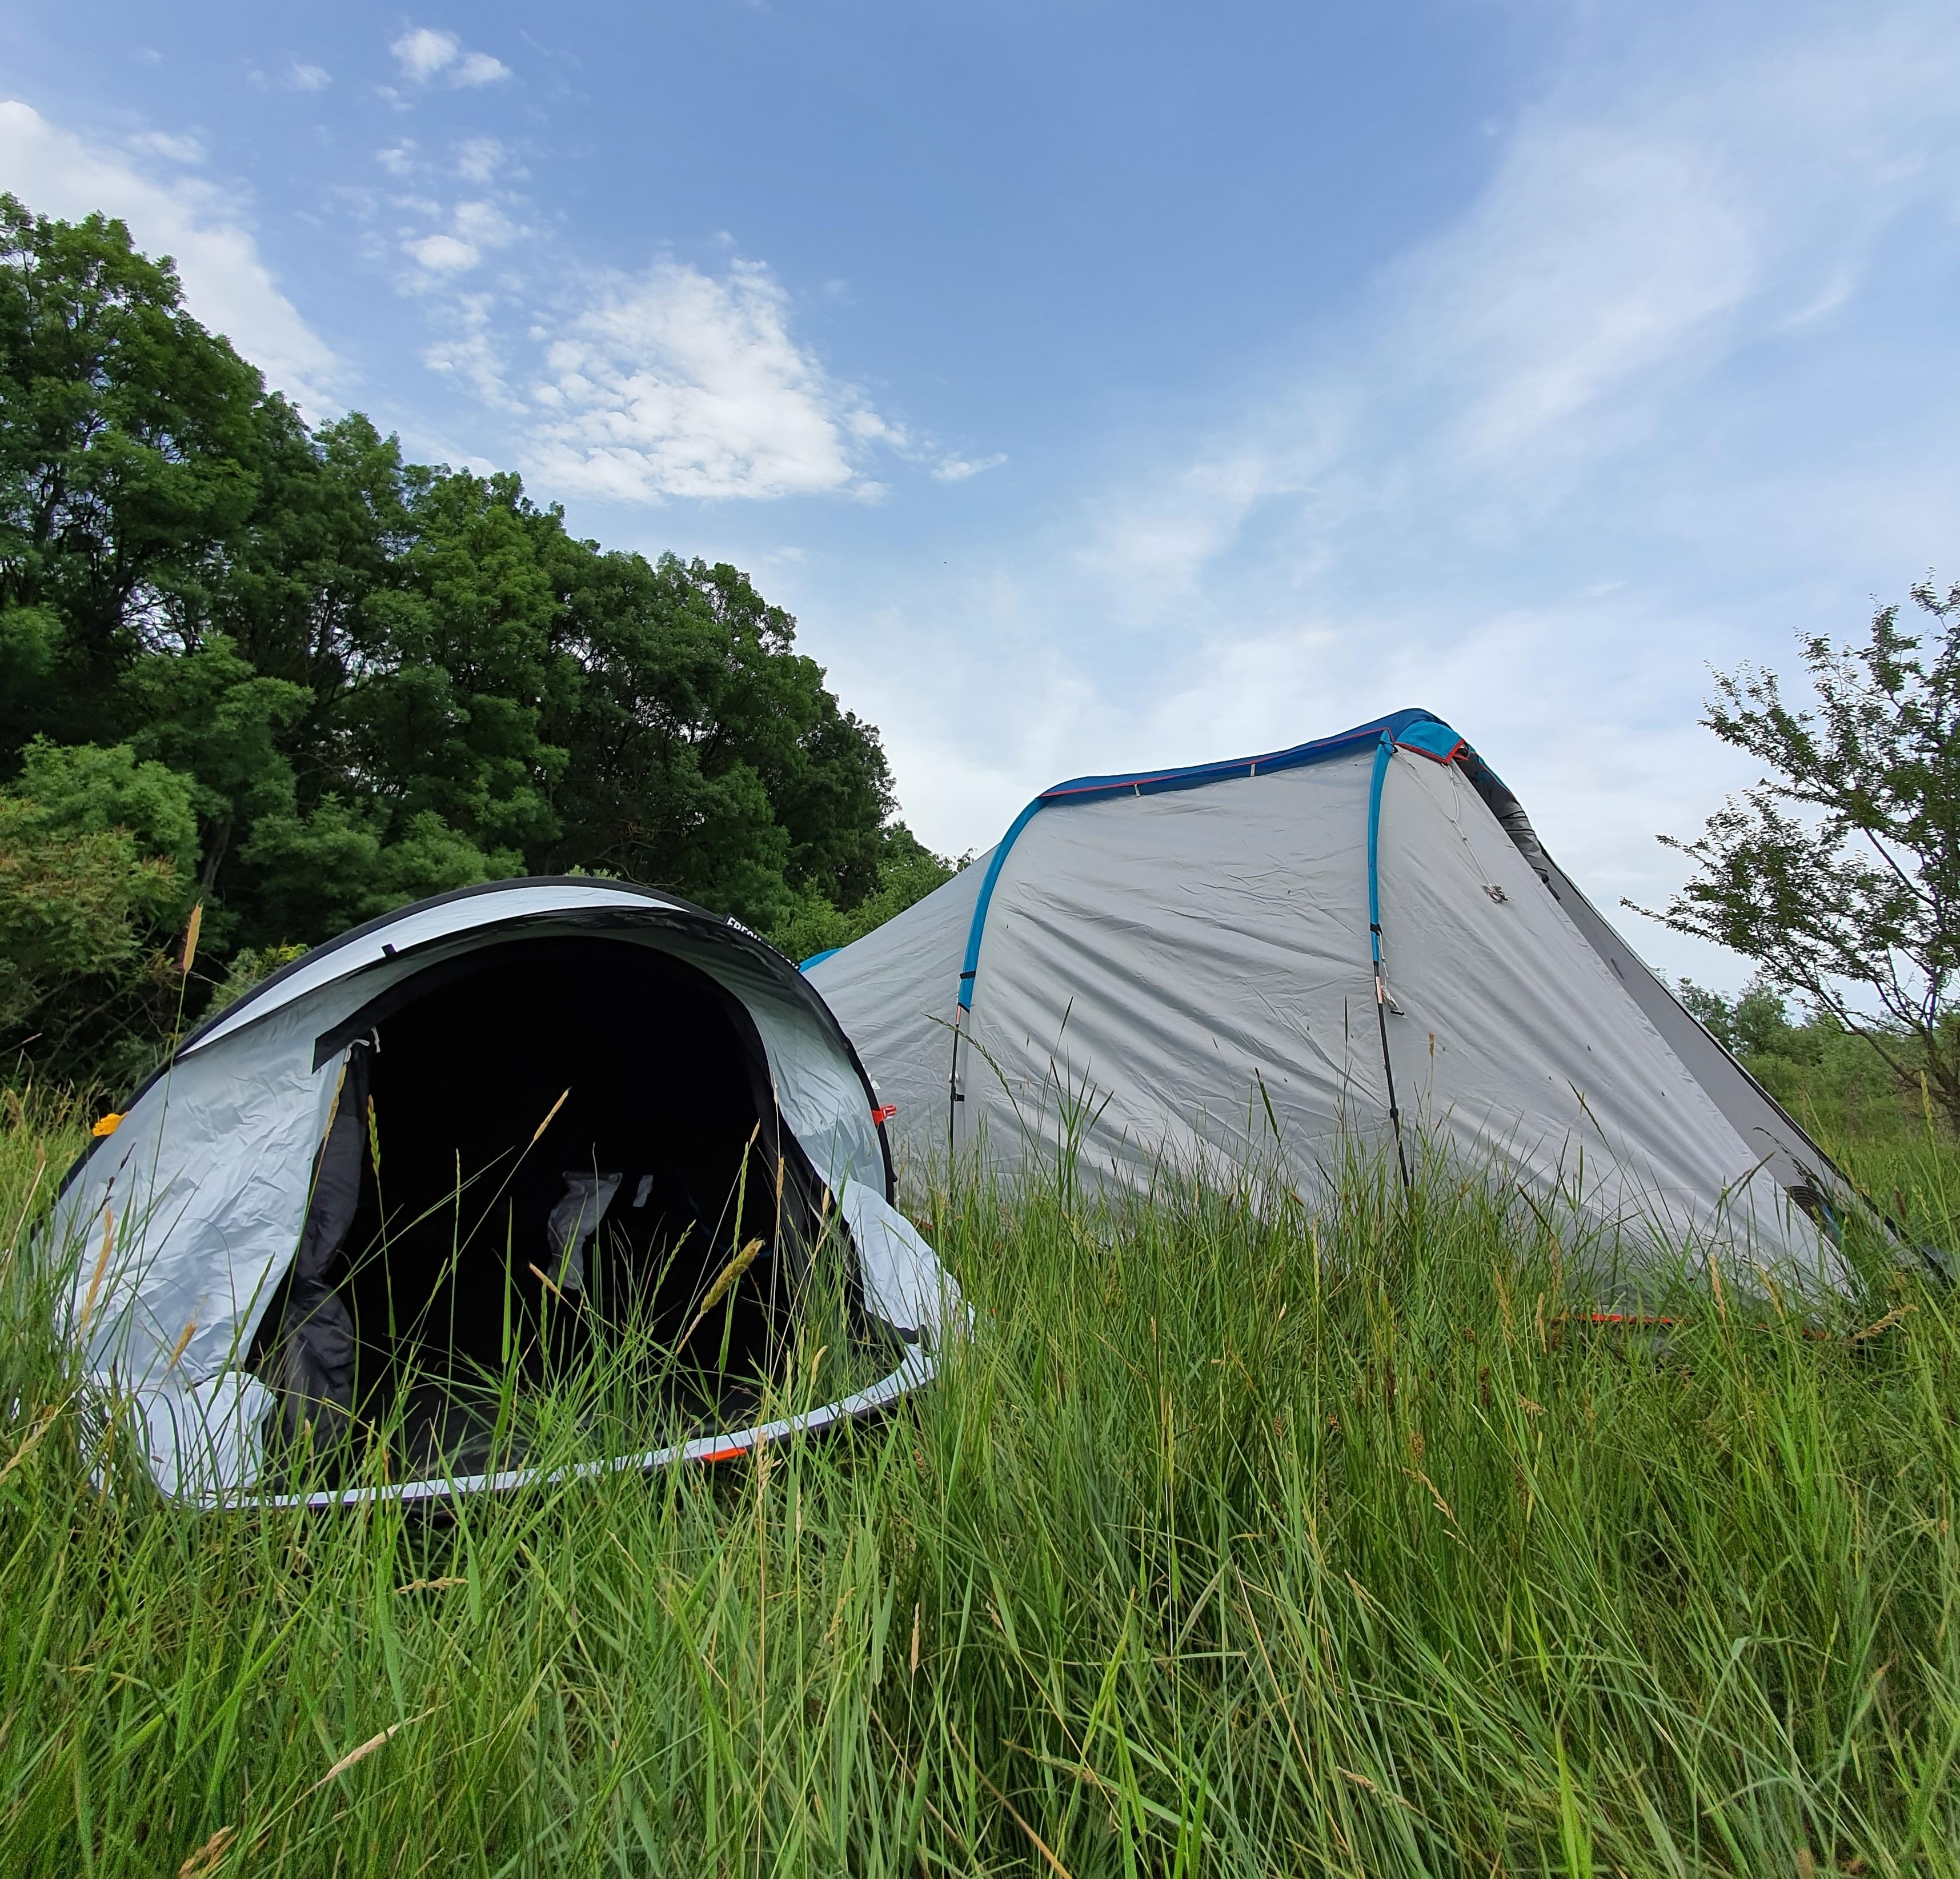 Inchirieri corturi și accesorii pentru camping